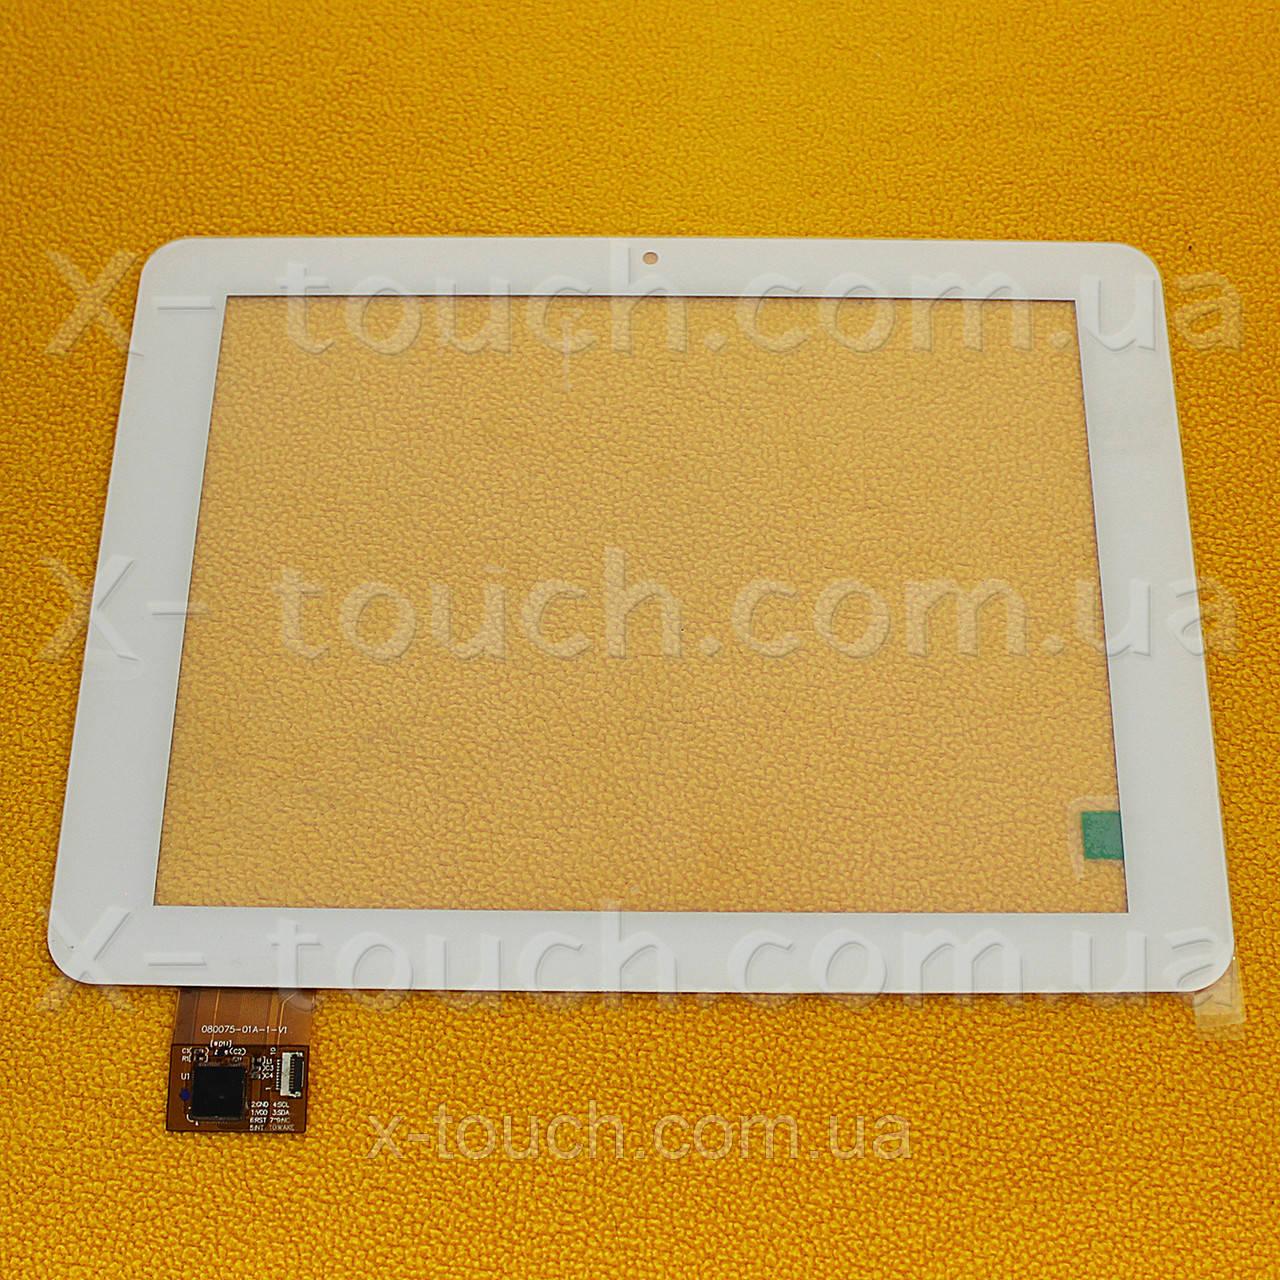 Тачскрин, сенсор ViewSonic ViewPad VB80a Pro для планшета